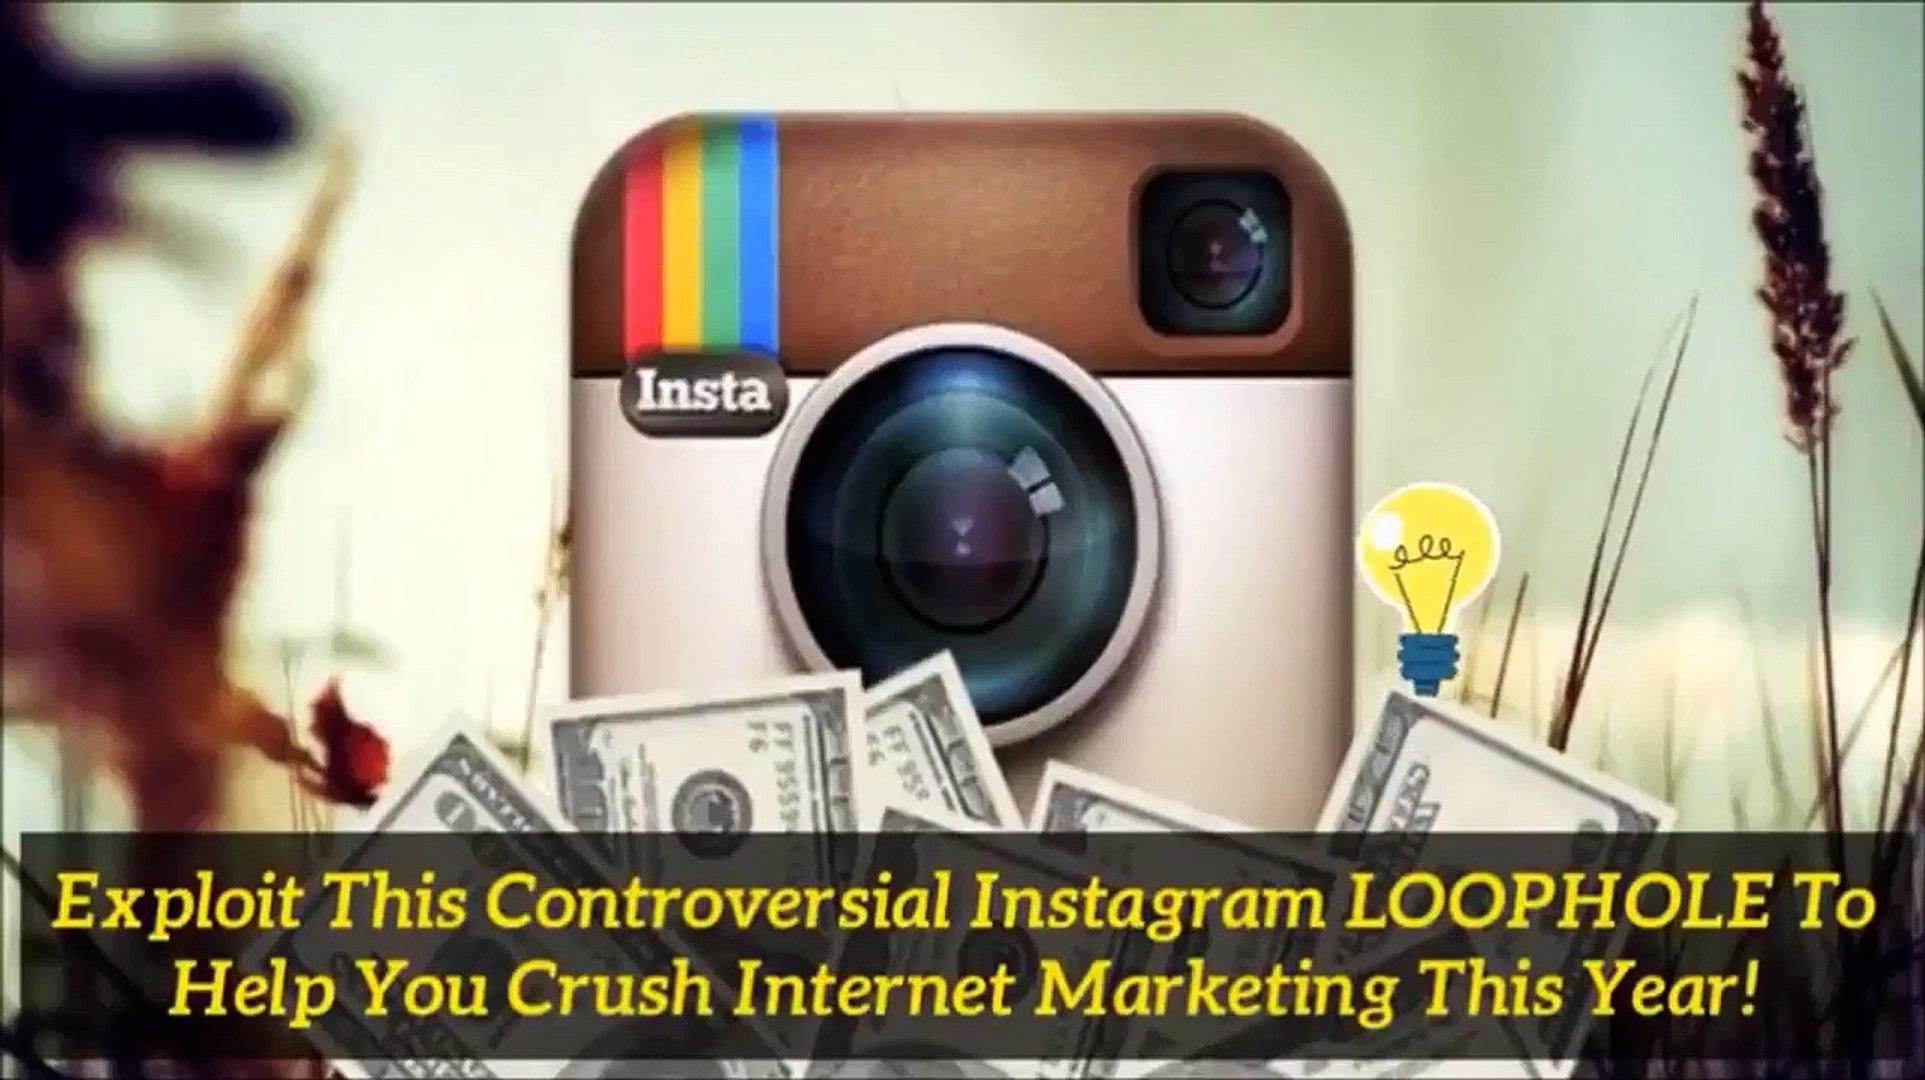 Easy Insta Profits - Easy Insta Profits Review - Make Money With Instagram!